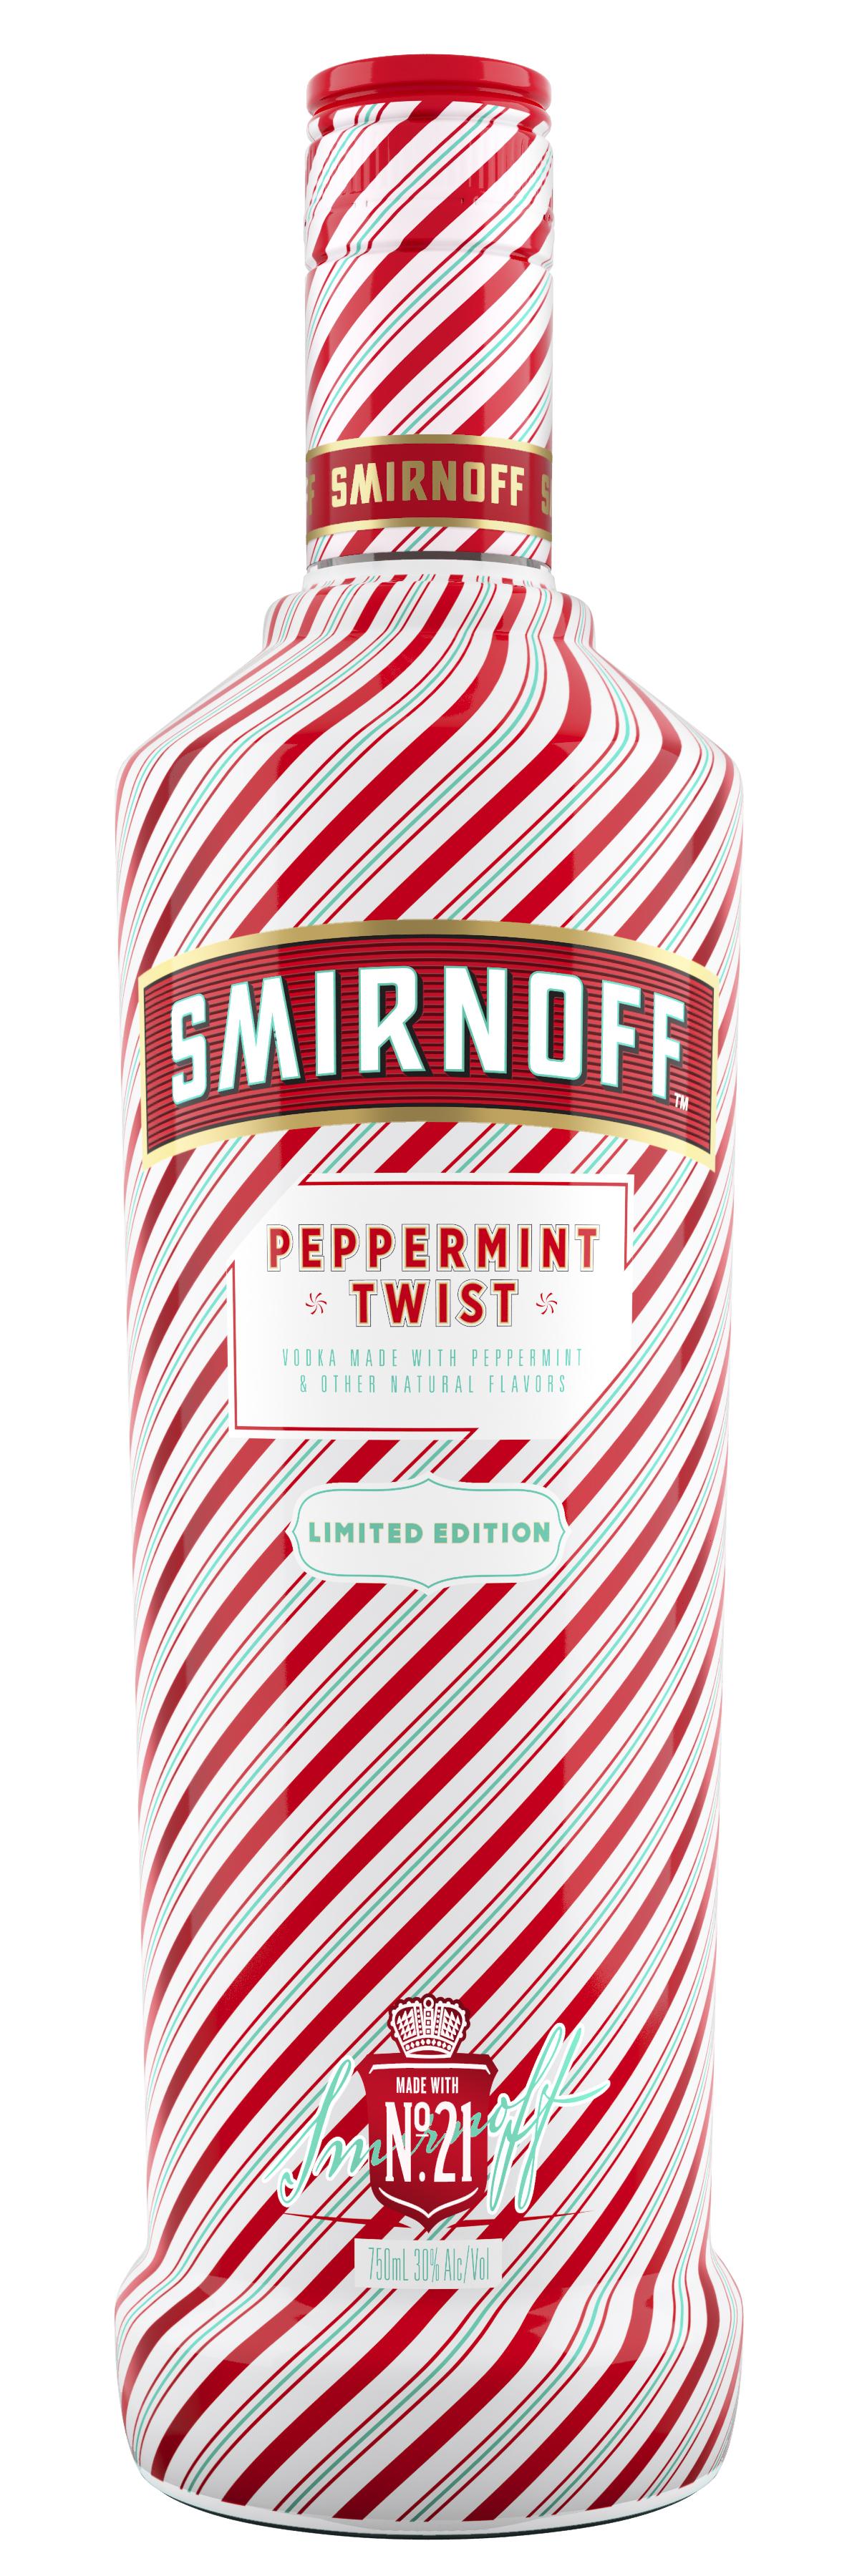 review smirnoff peppermint twist drinkhacker